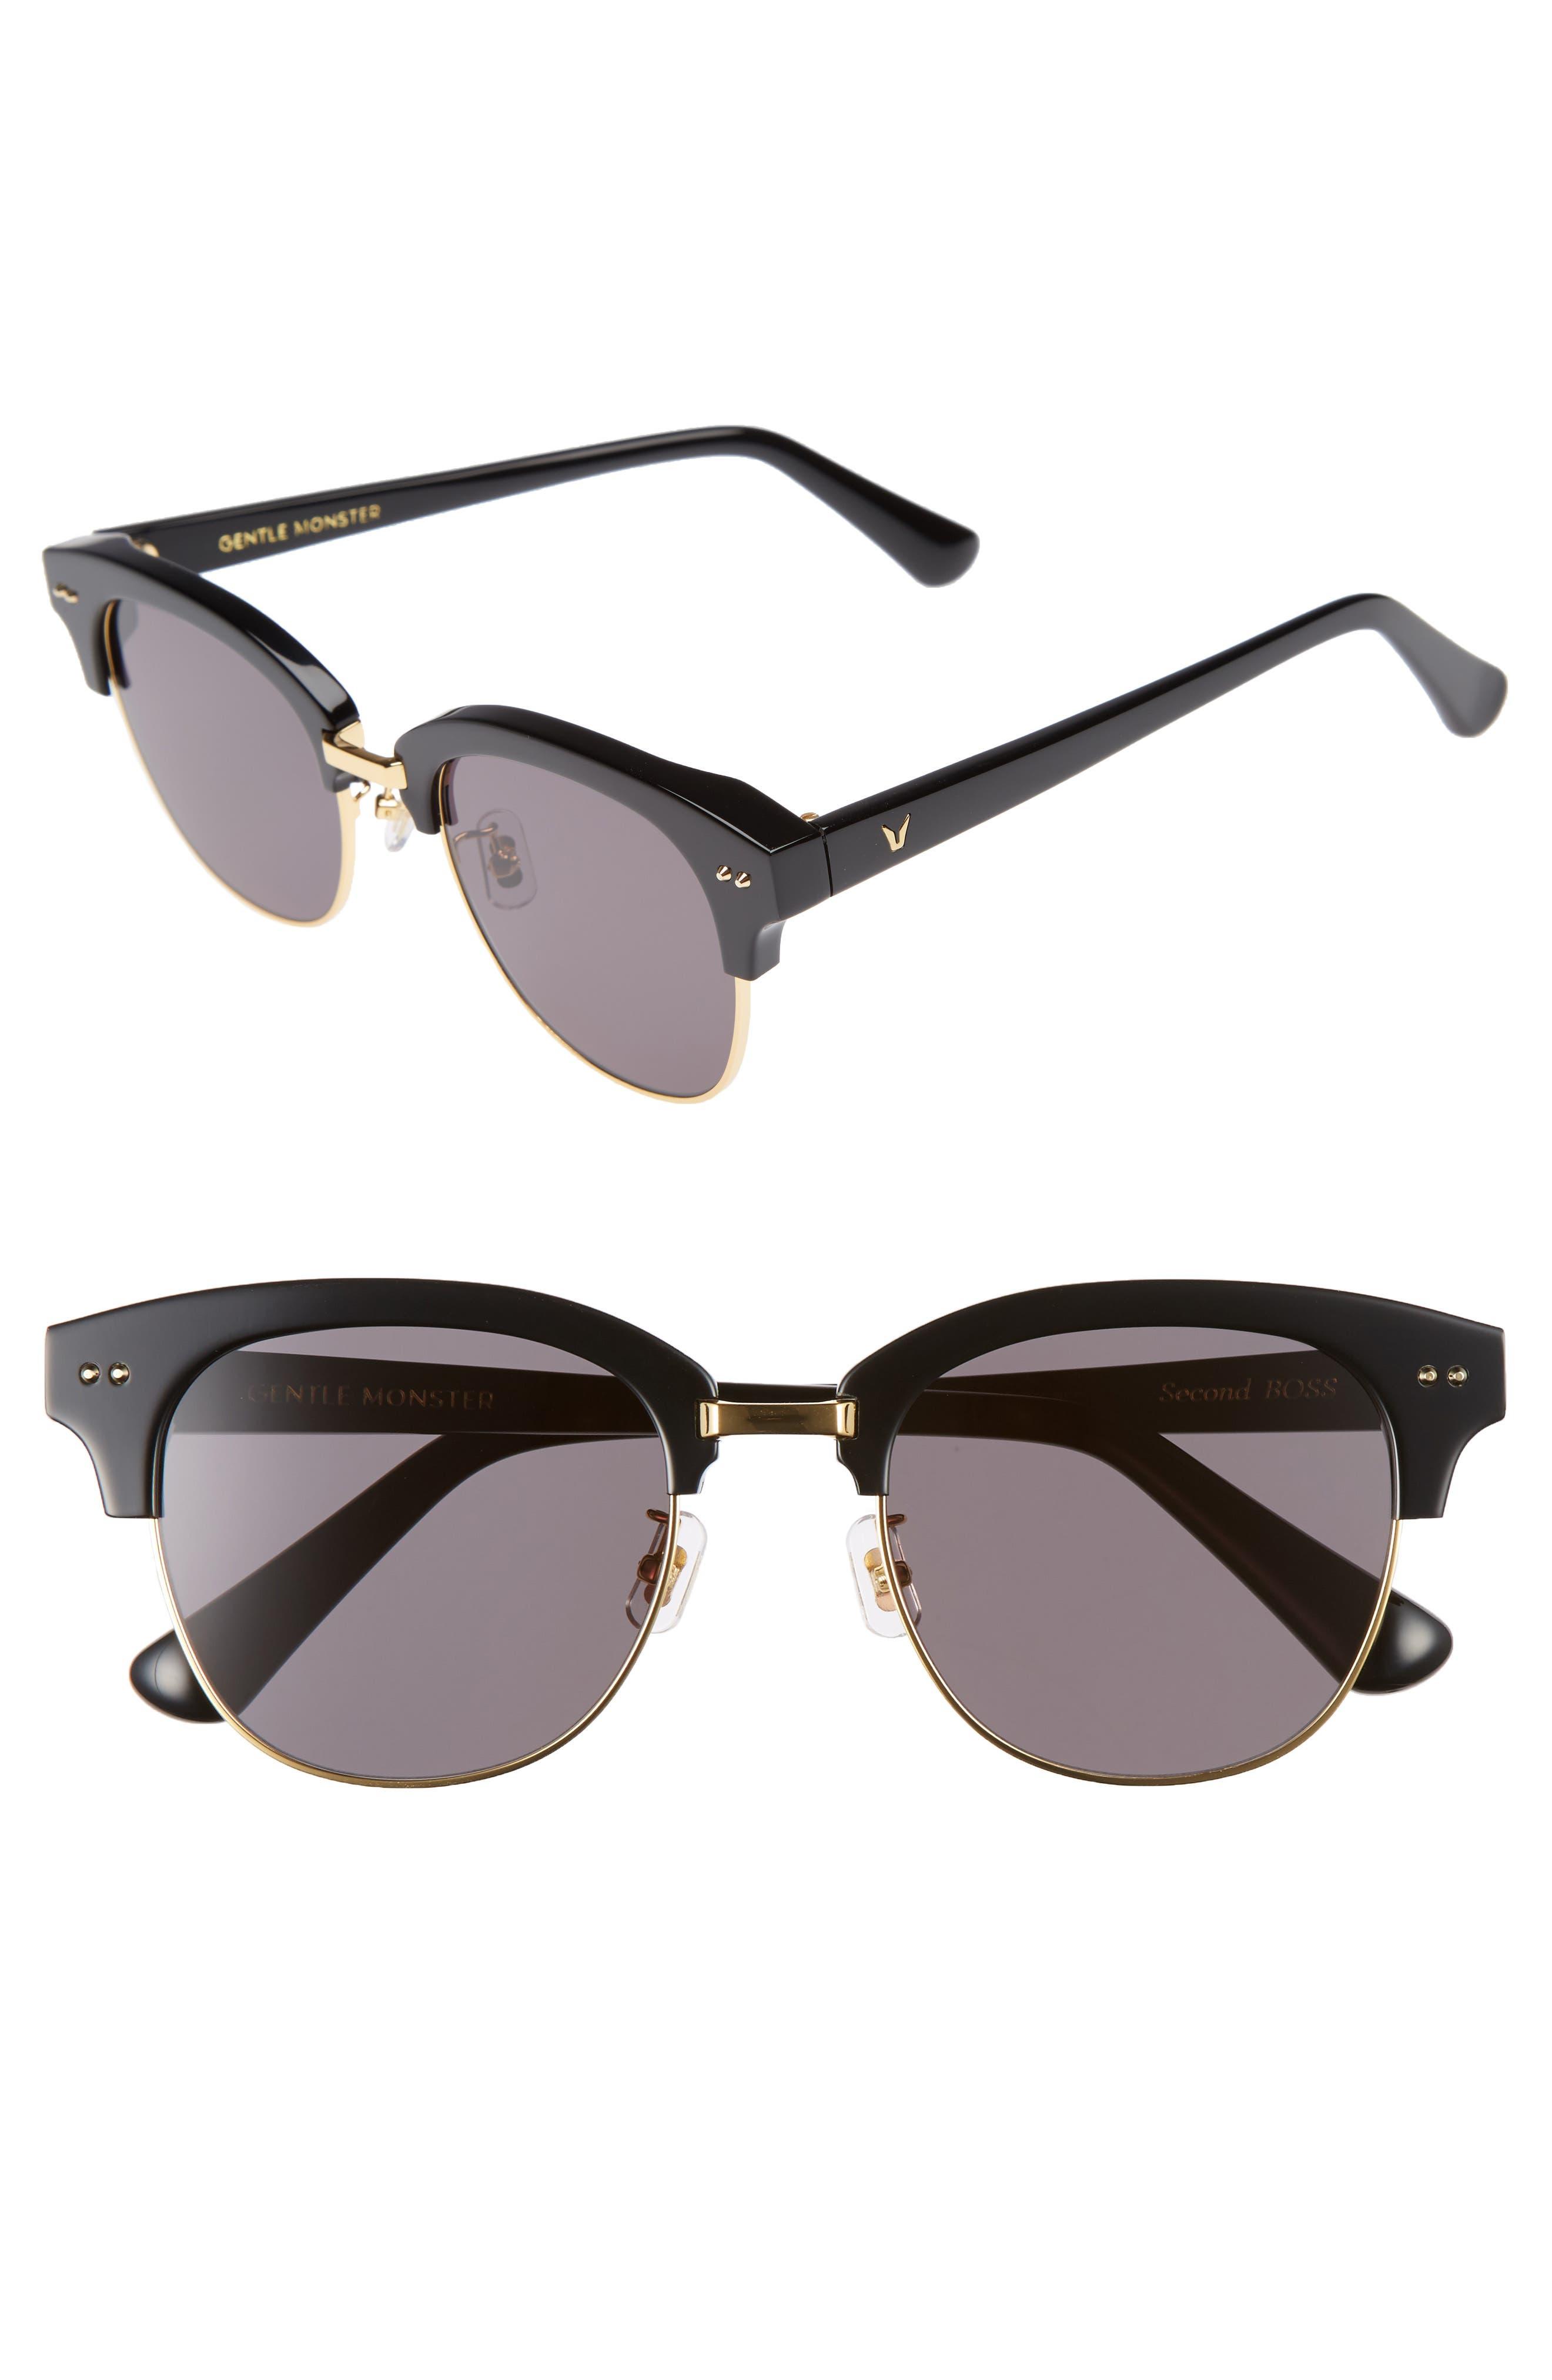 GENTLE MONSTER Second Boss 51mm Retro Sunglasses, Main, color, 001